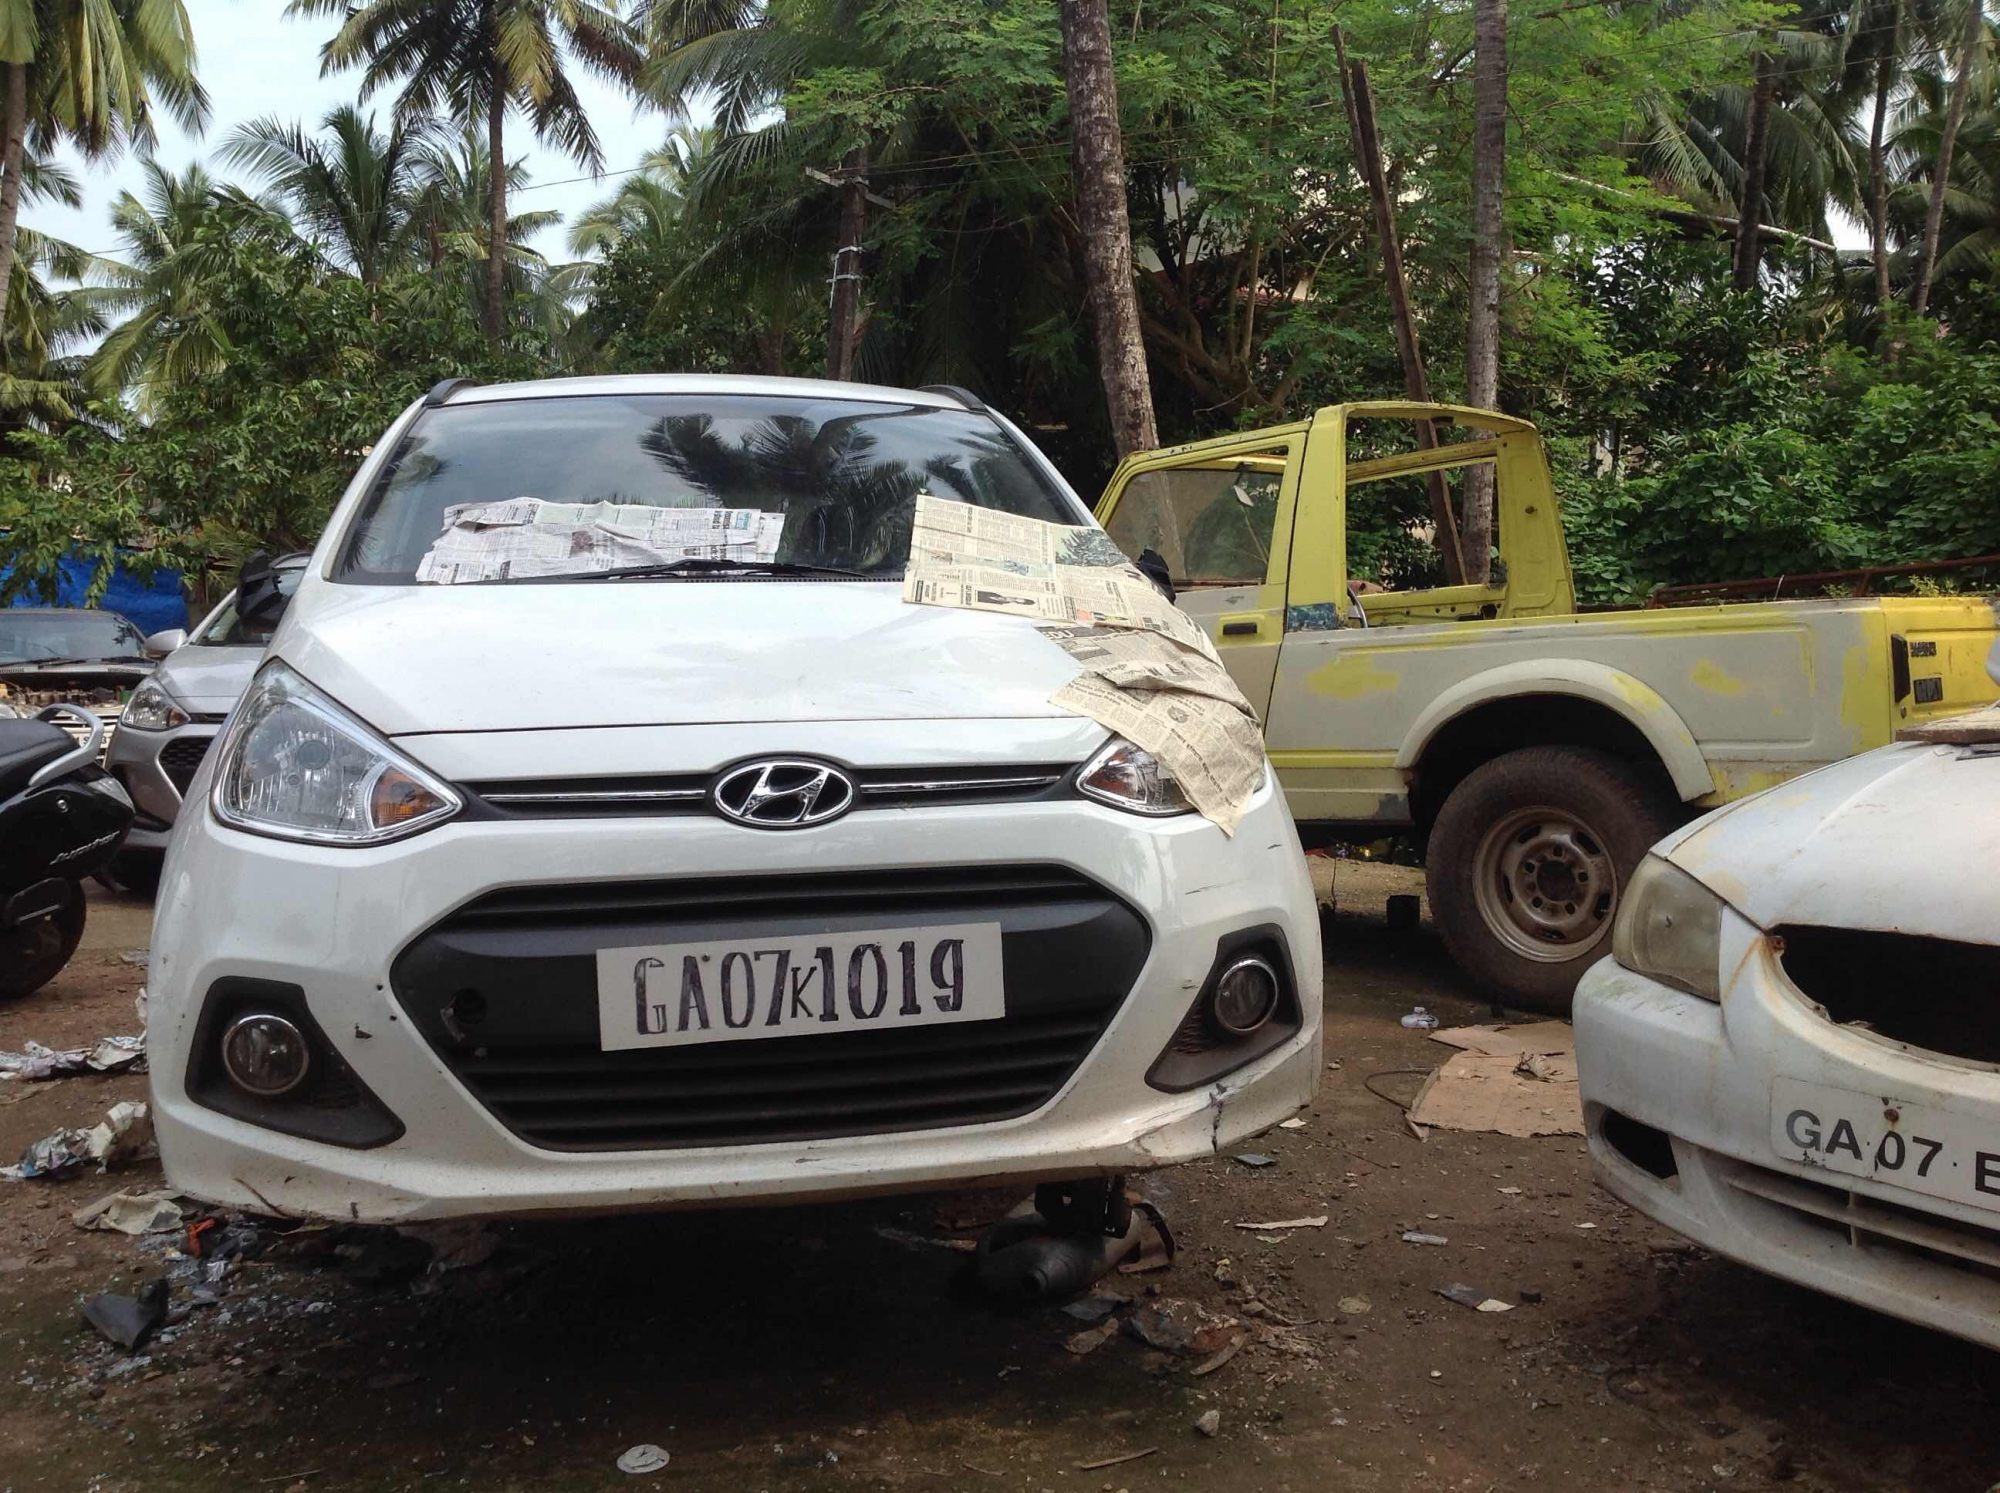 Top 50 Vintage Car Restoration Services in Panjim, Goa - Justdial